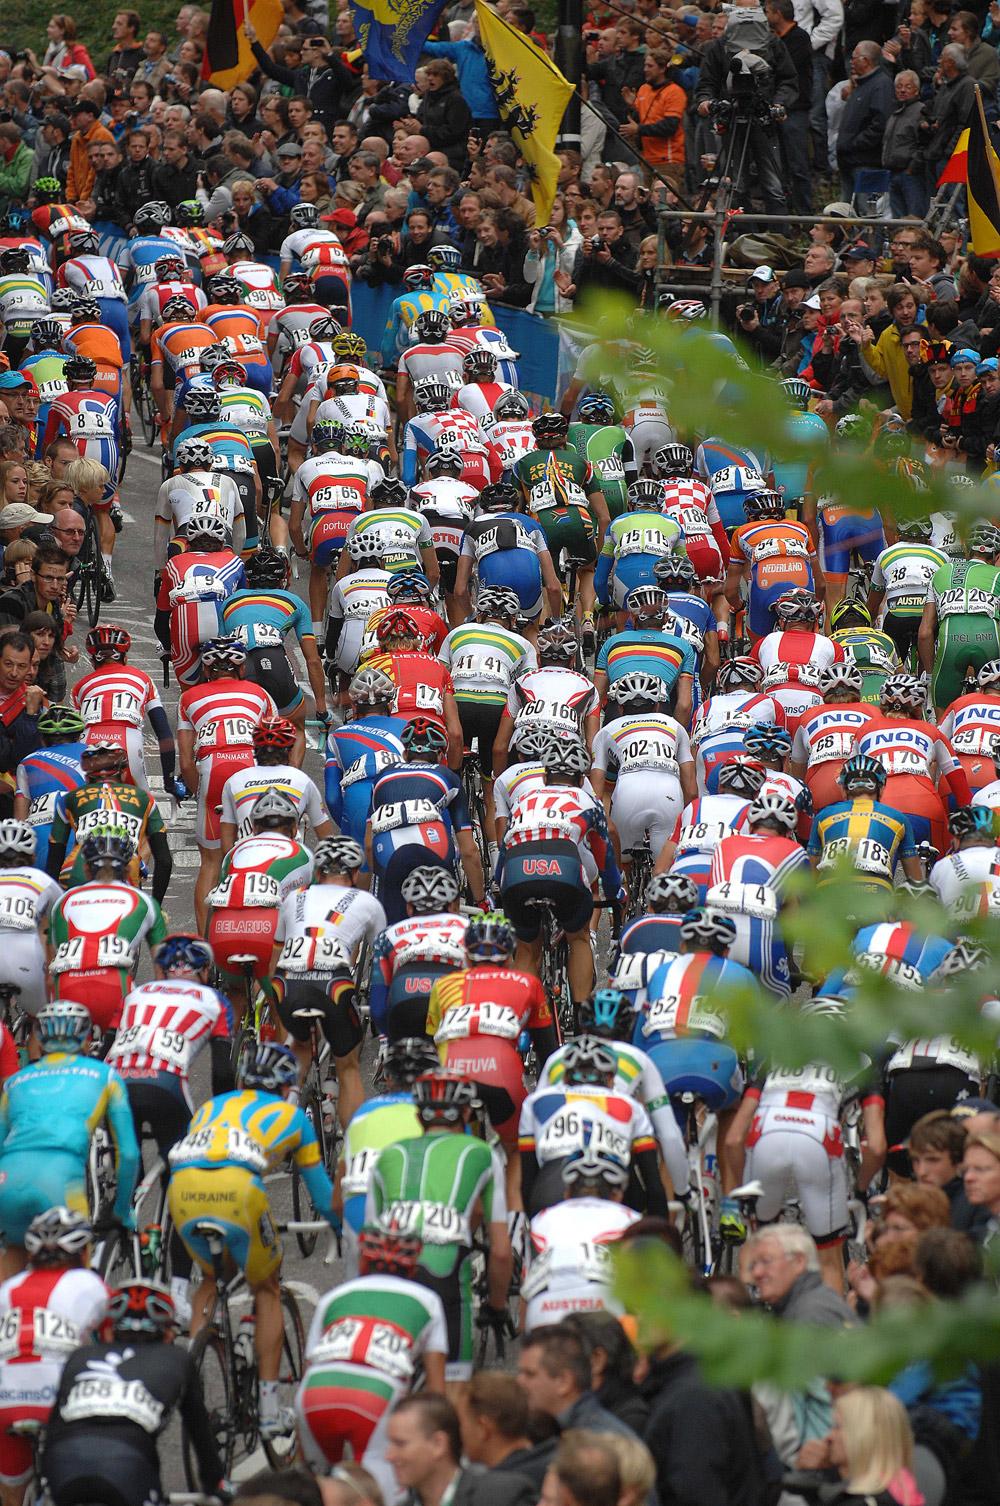 World Cyclist Championship 2012 - Walkemburg (Nl)